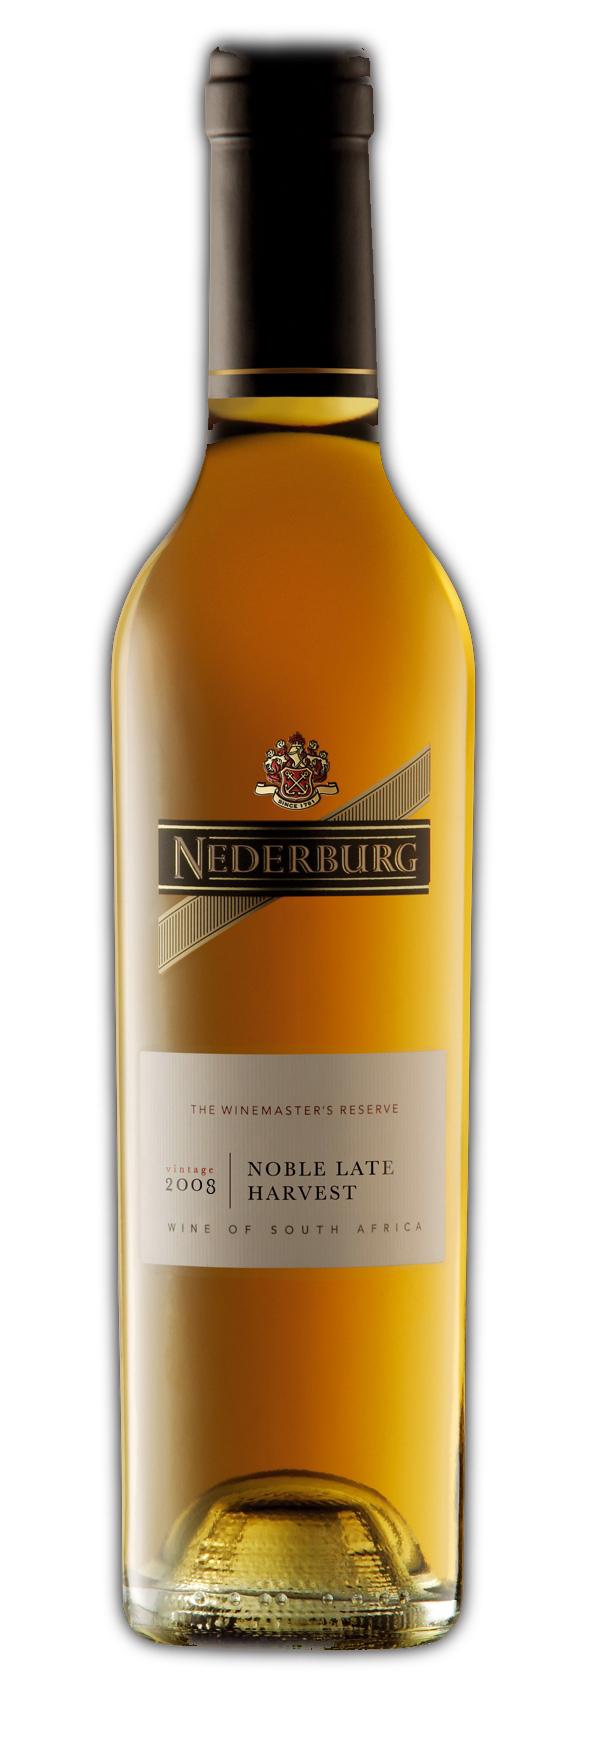 RJ RL VVS Nederburg Noble LH